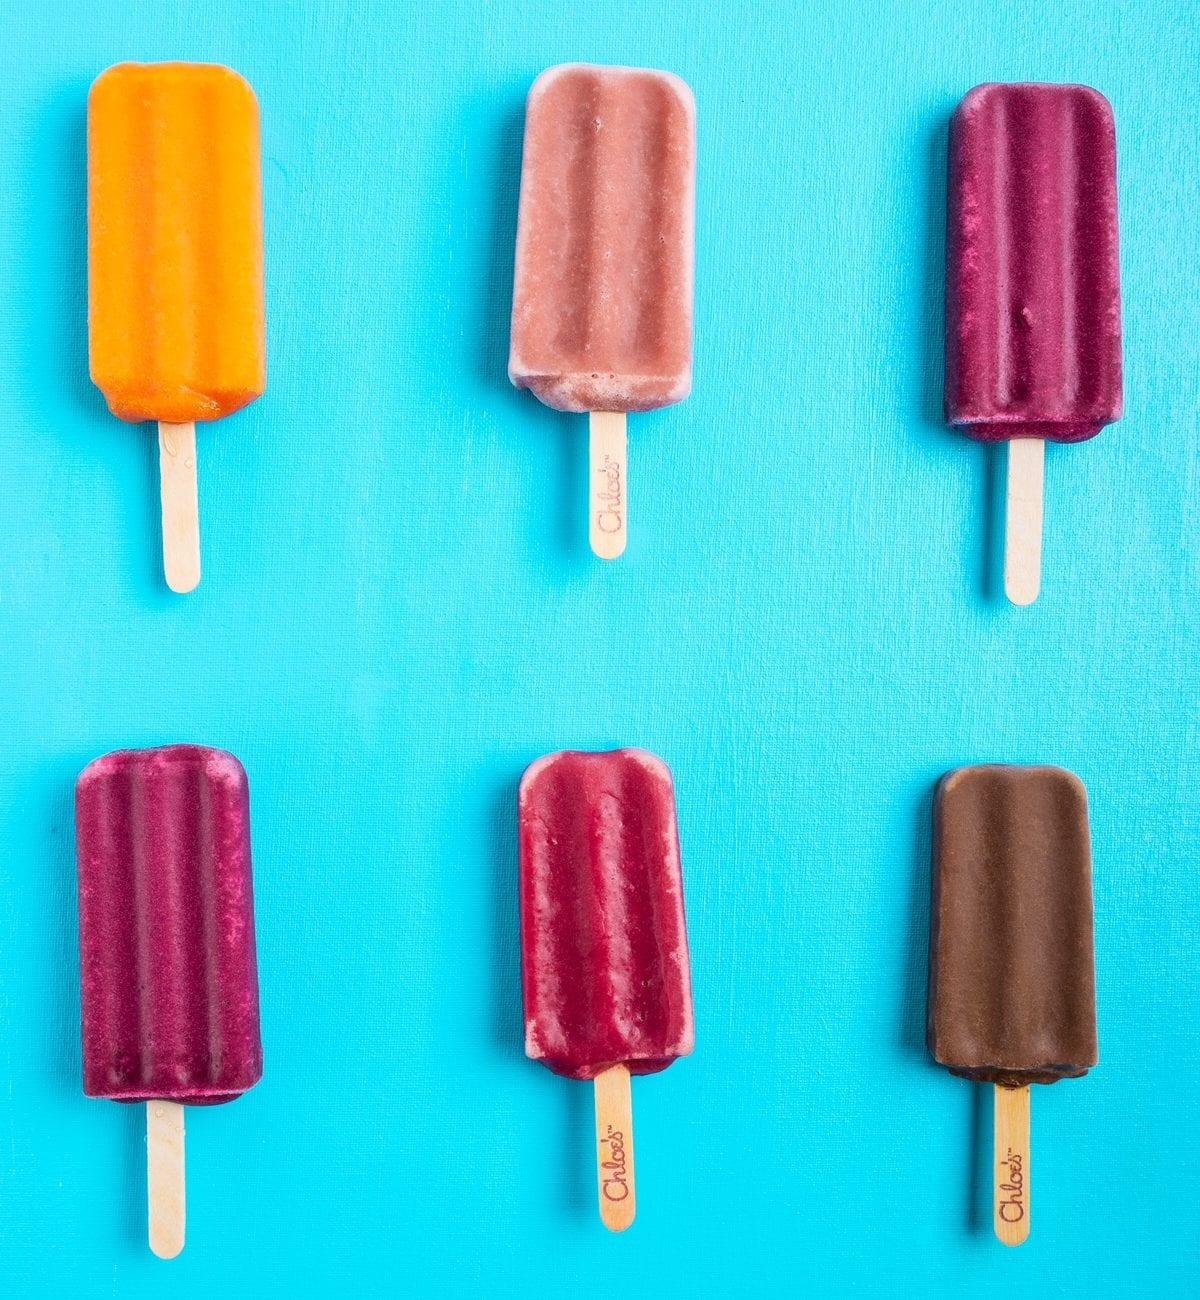 Popcycle Frozen Treats Gourmet Desserts Martha's Vineyard